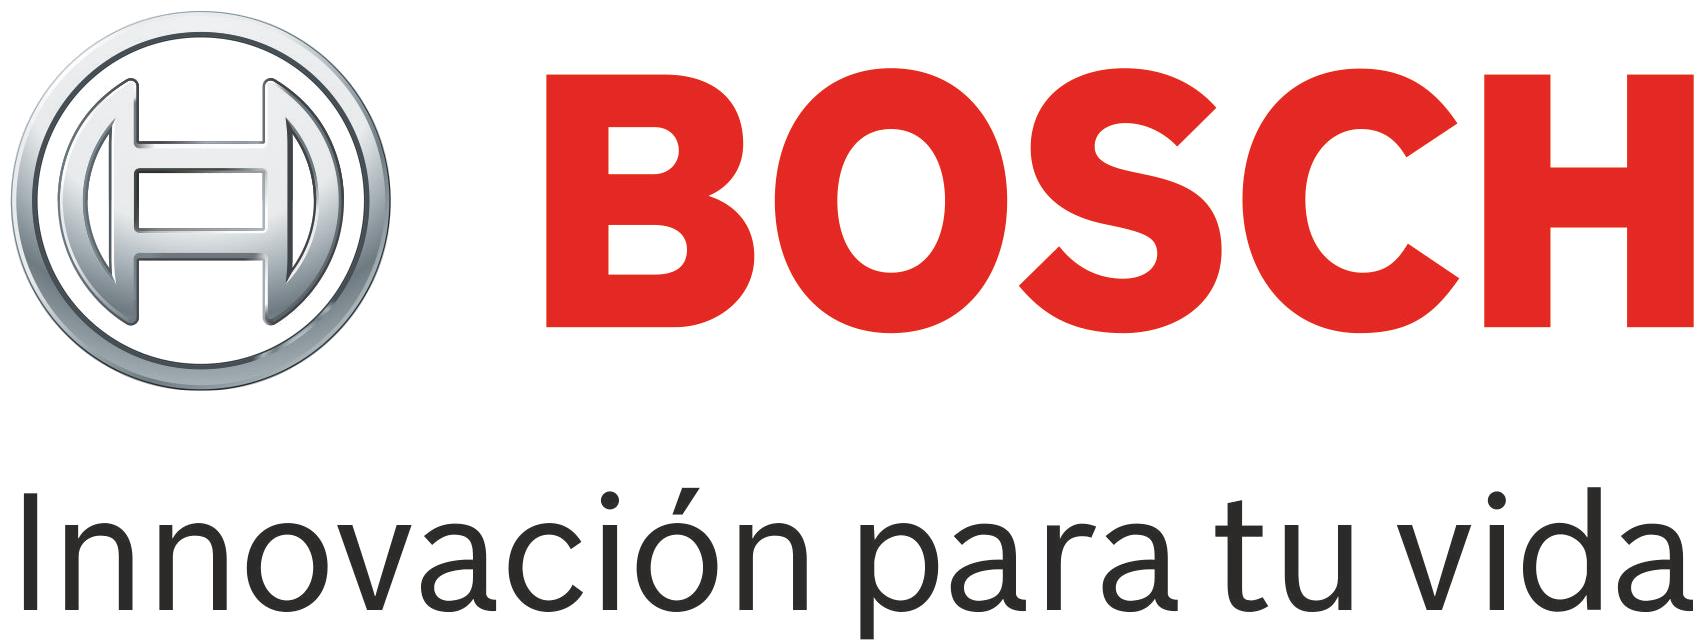 Bosch-Innovación para tu vida